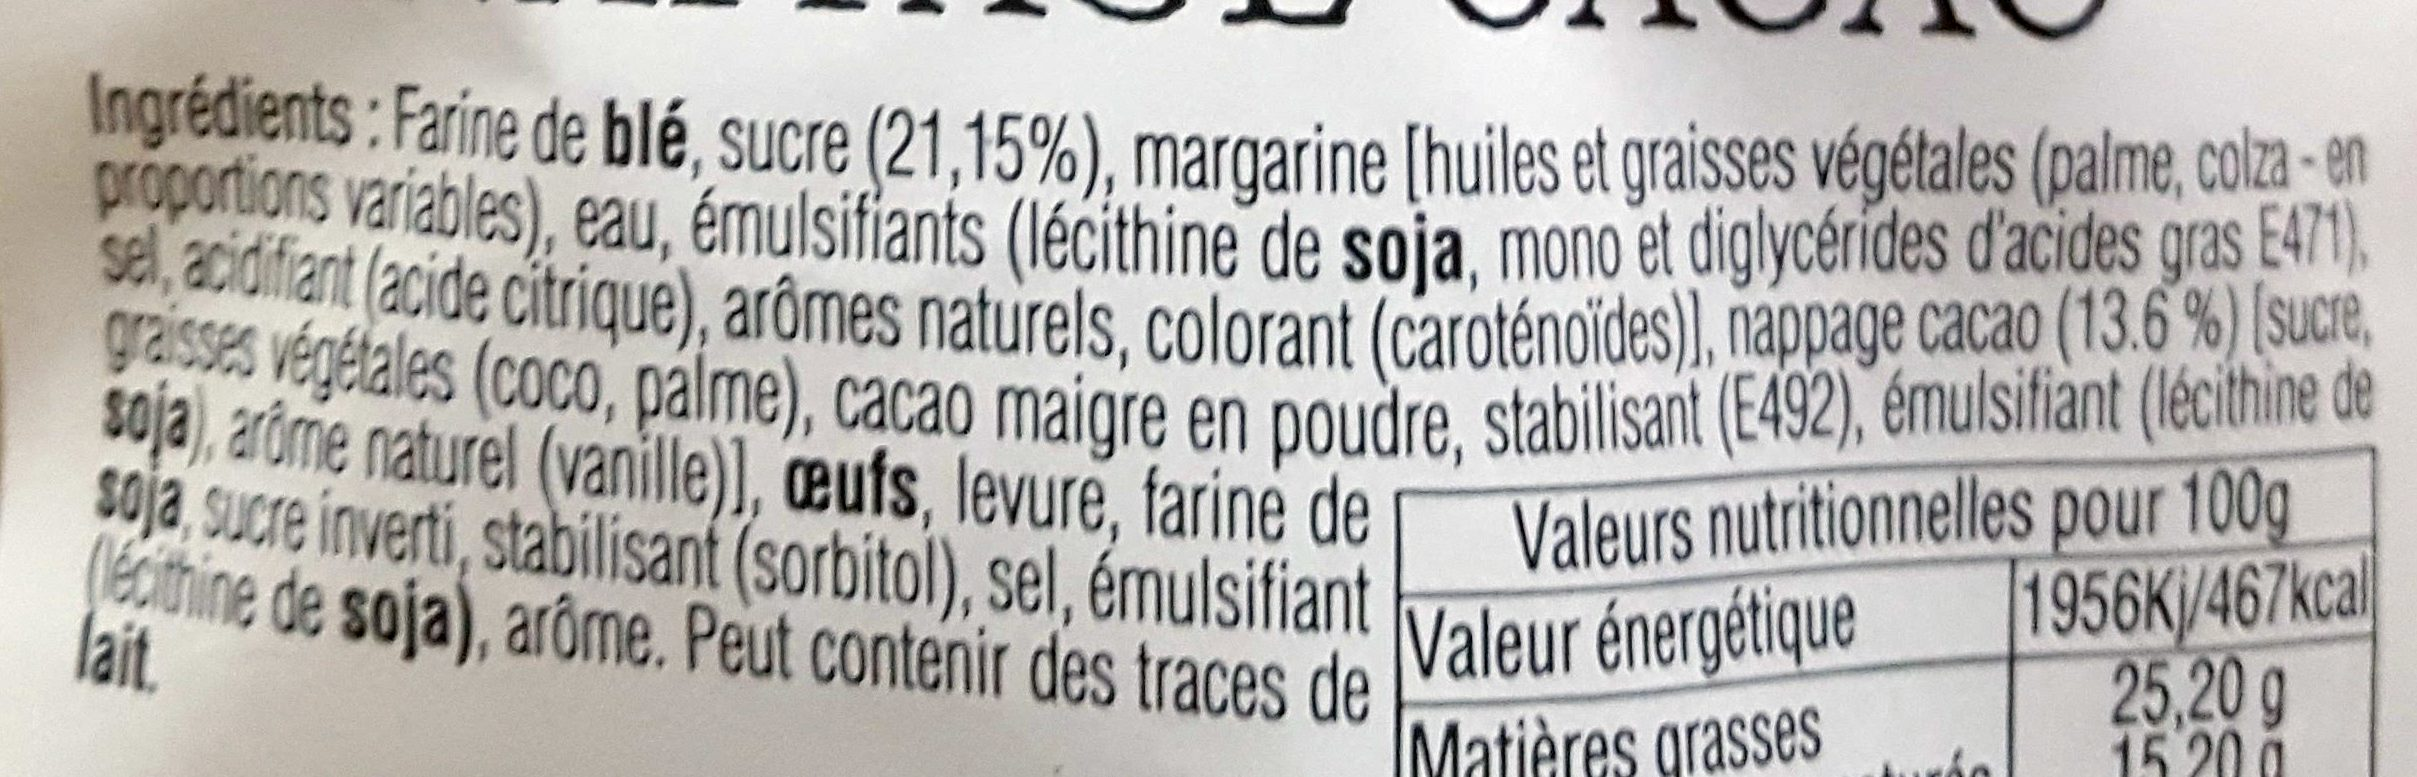 Gaufres liégeoises nappage cacao - Ingrédients - fr